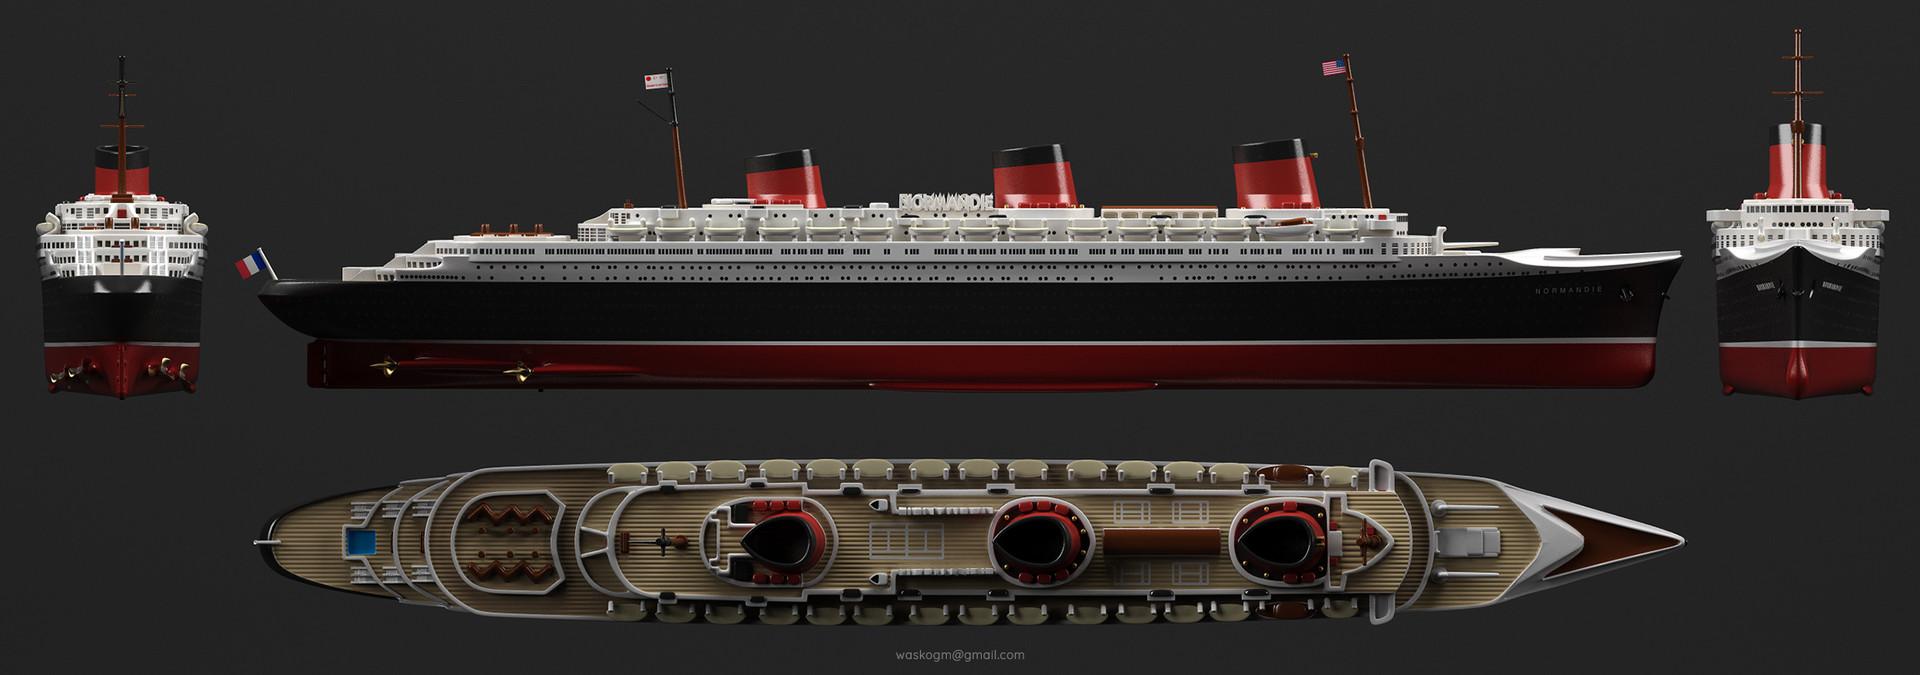 vasilije ristovic ocean liner quotss normandiequot 1932